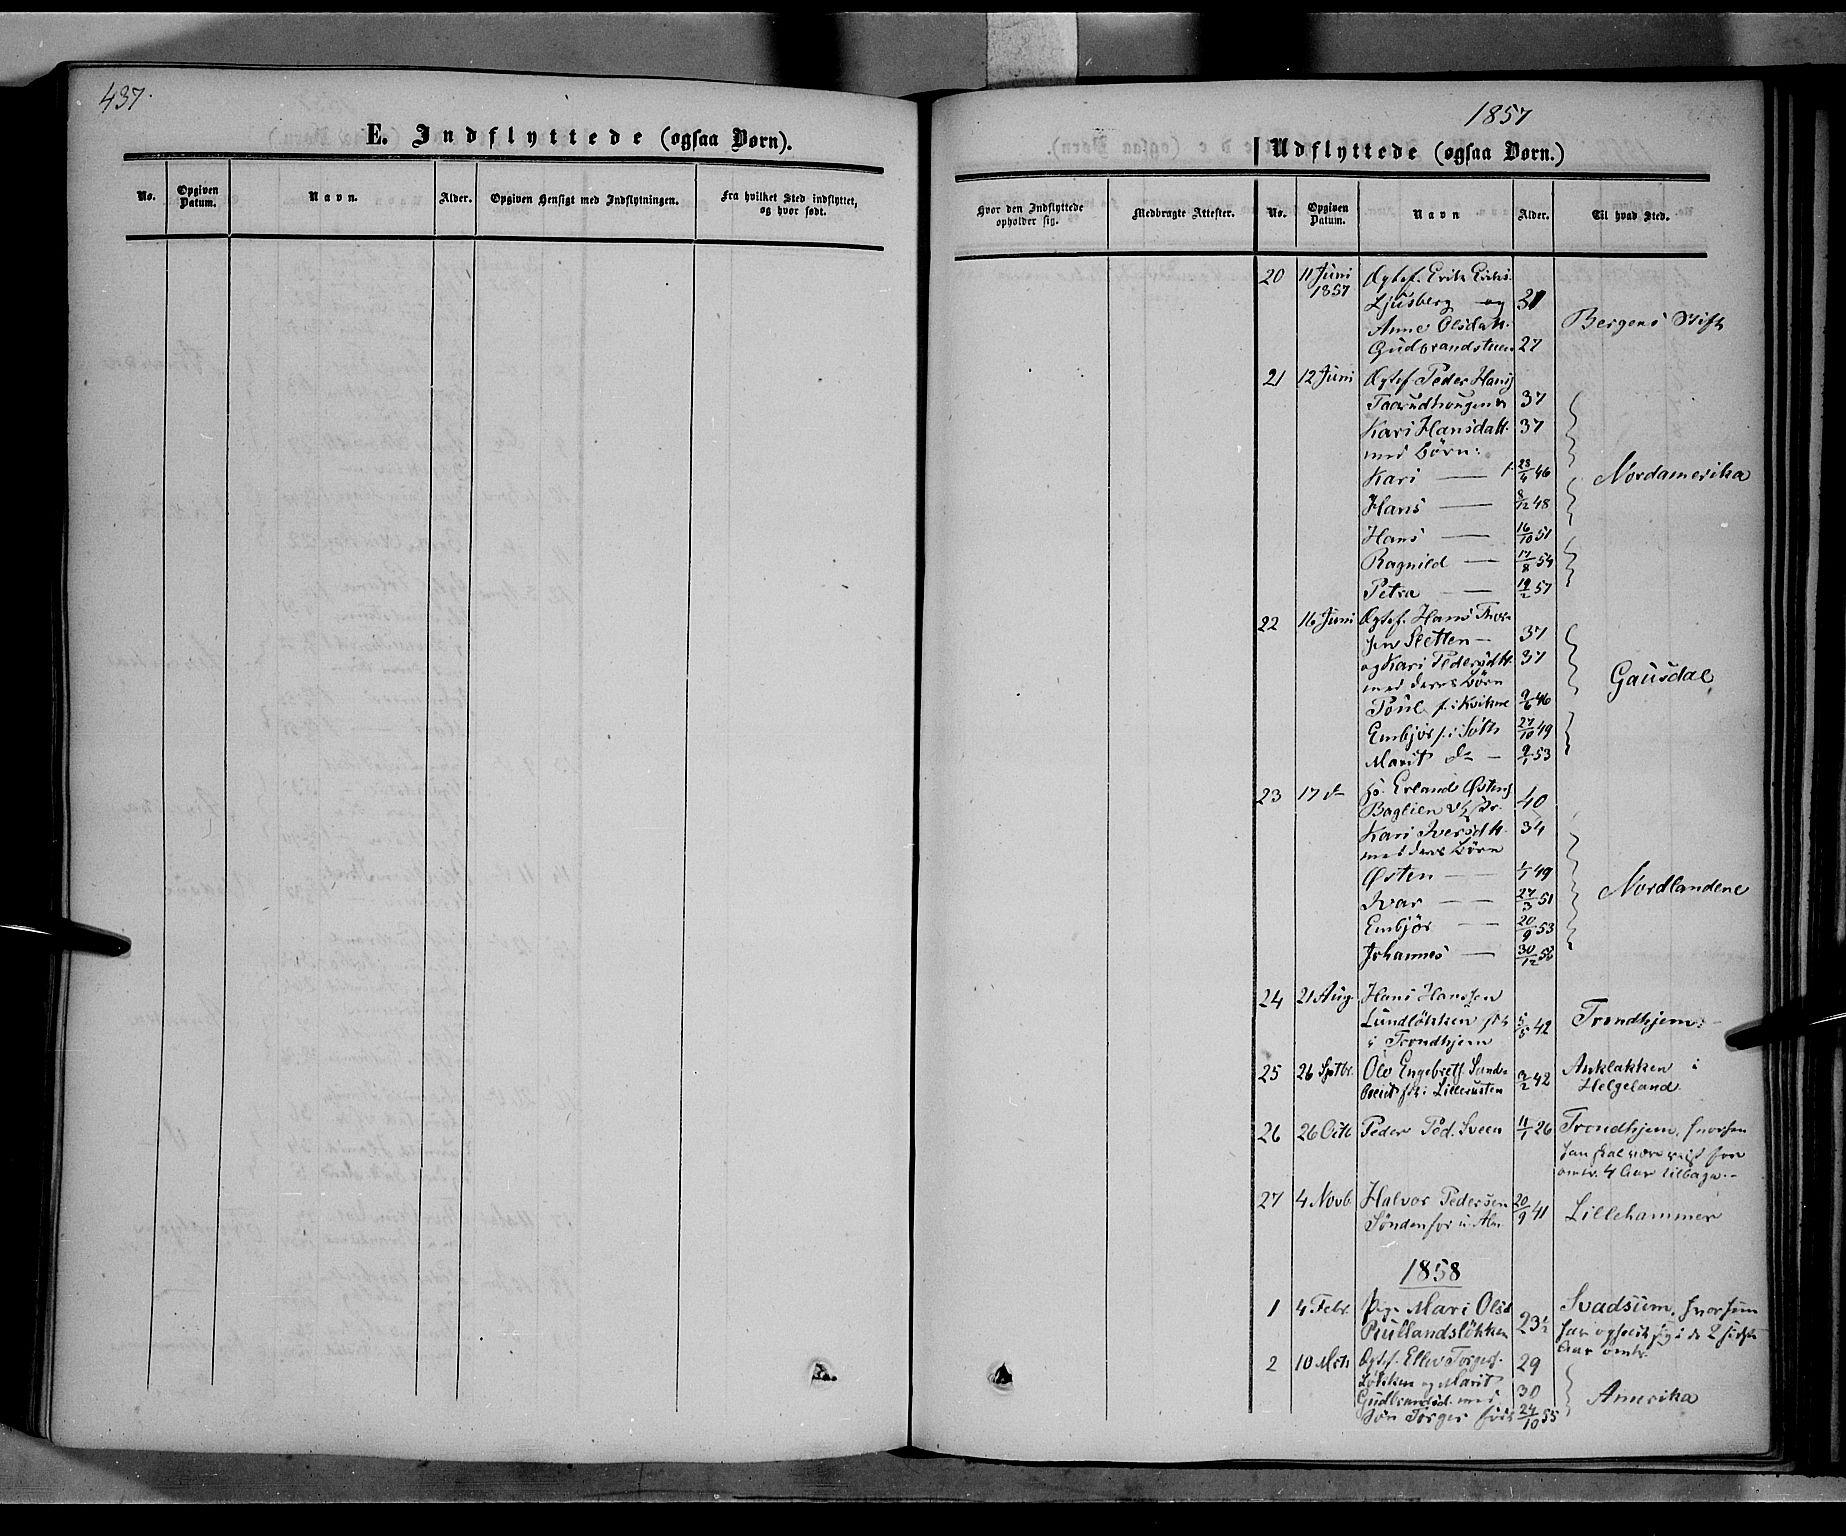 SAH, Nord-Fron prestekontor, Ministerialbok nr. 1, 1851-1864, s. 437